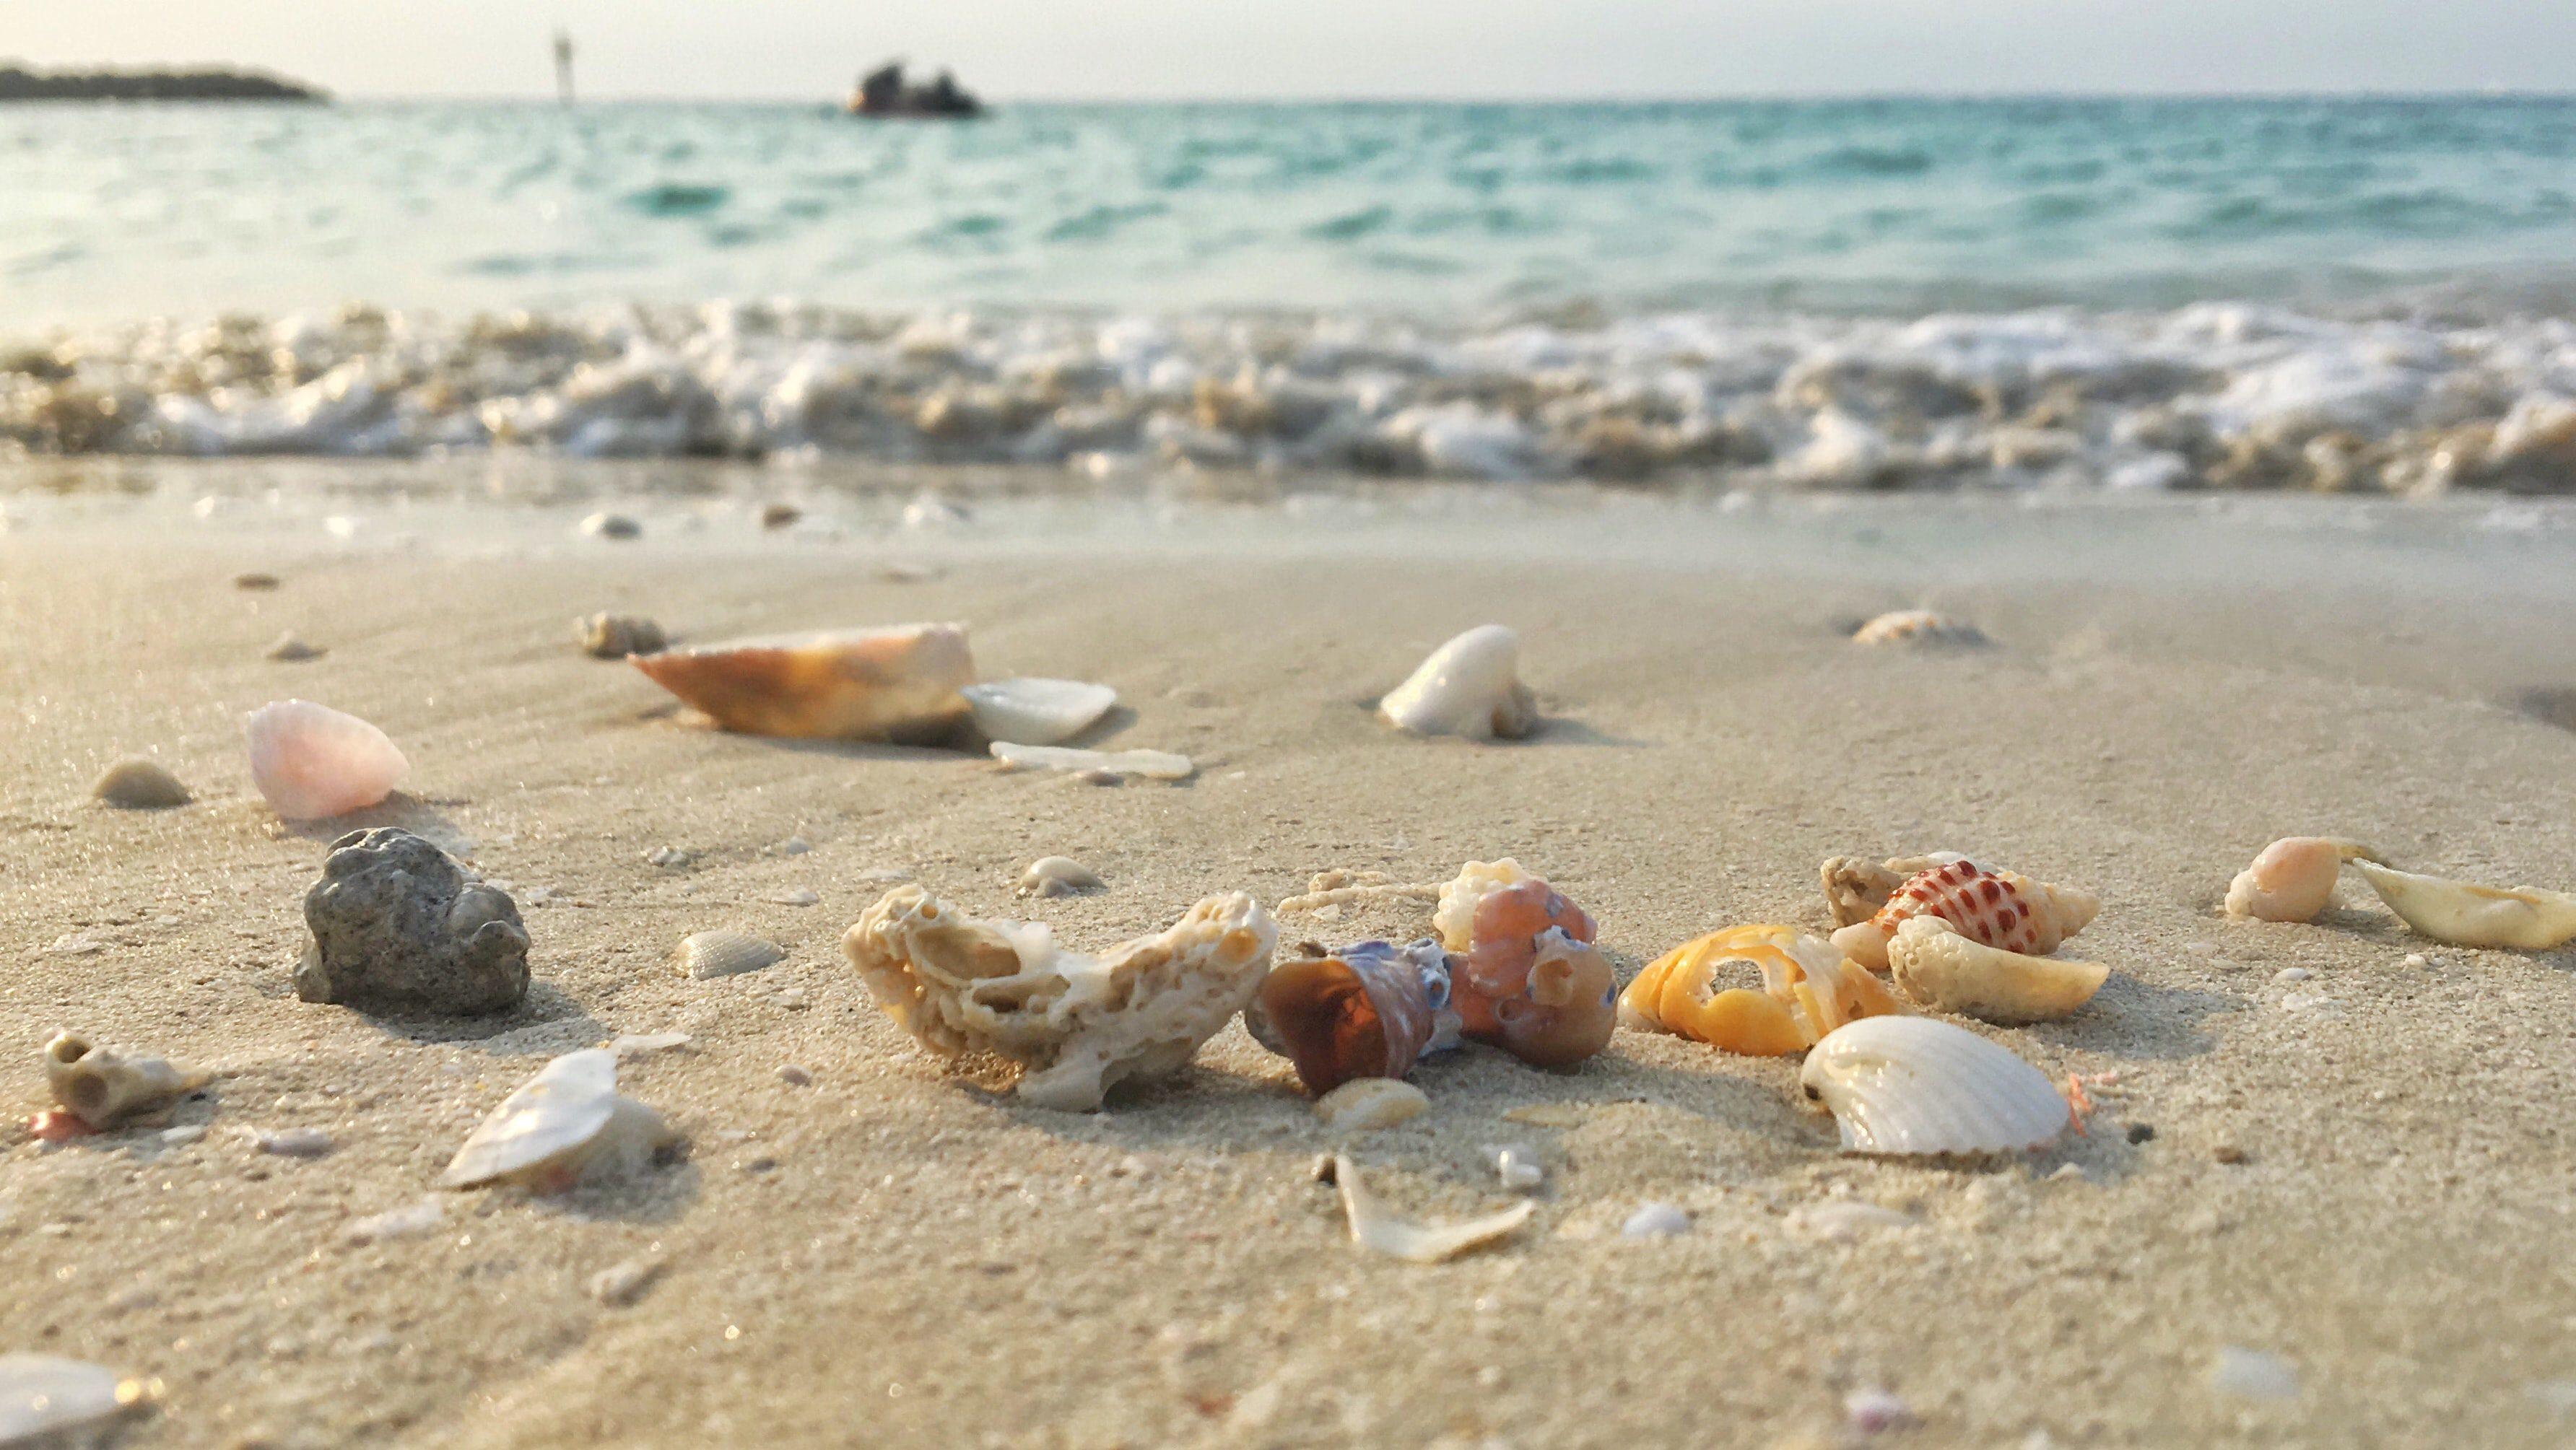 seashells on sand, foamy sea